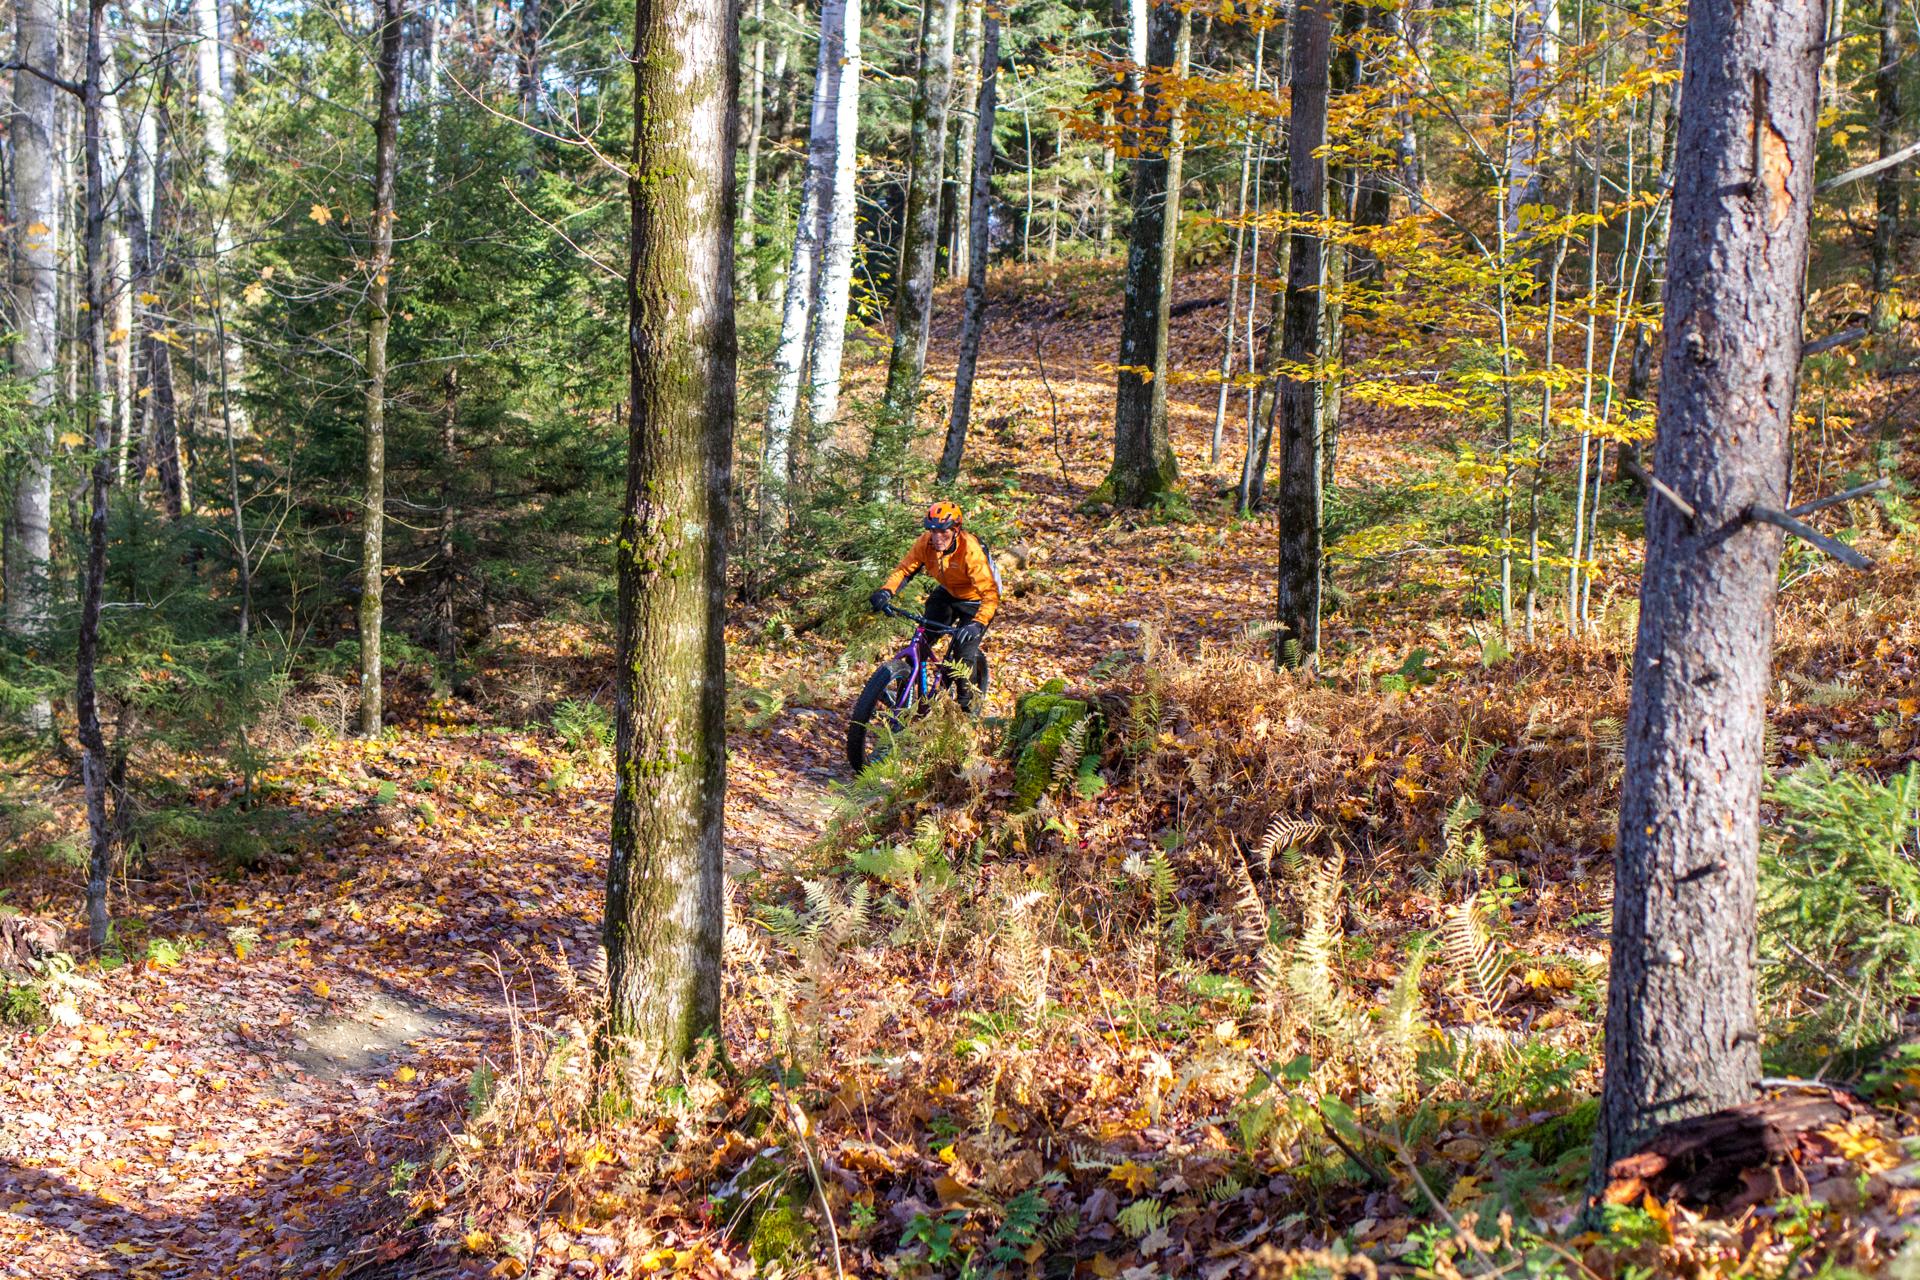 2016-10-22-24-JA-snoliage-ride-scenics0013-2.jpg